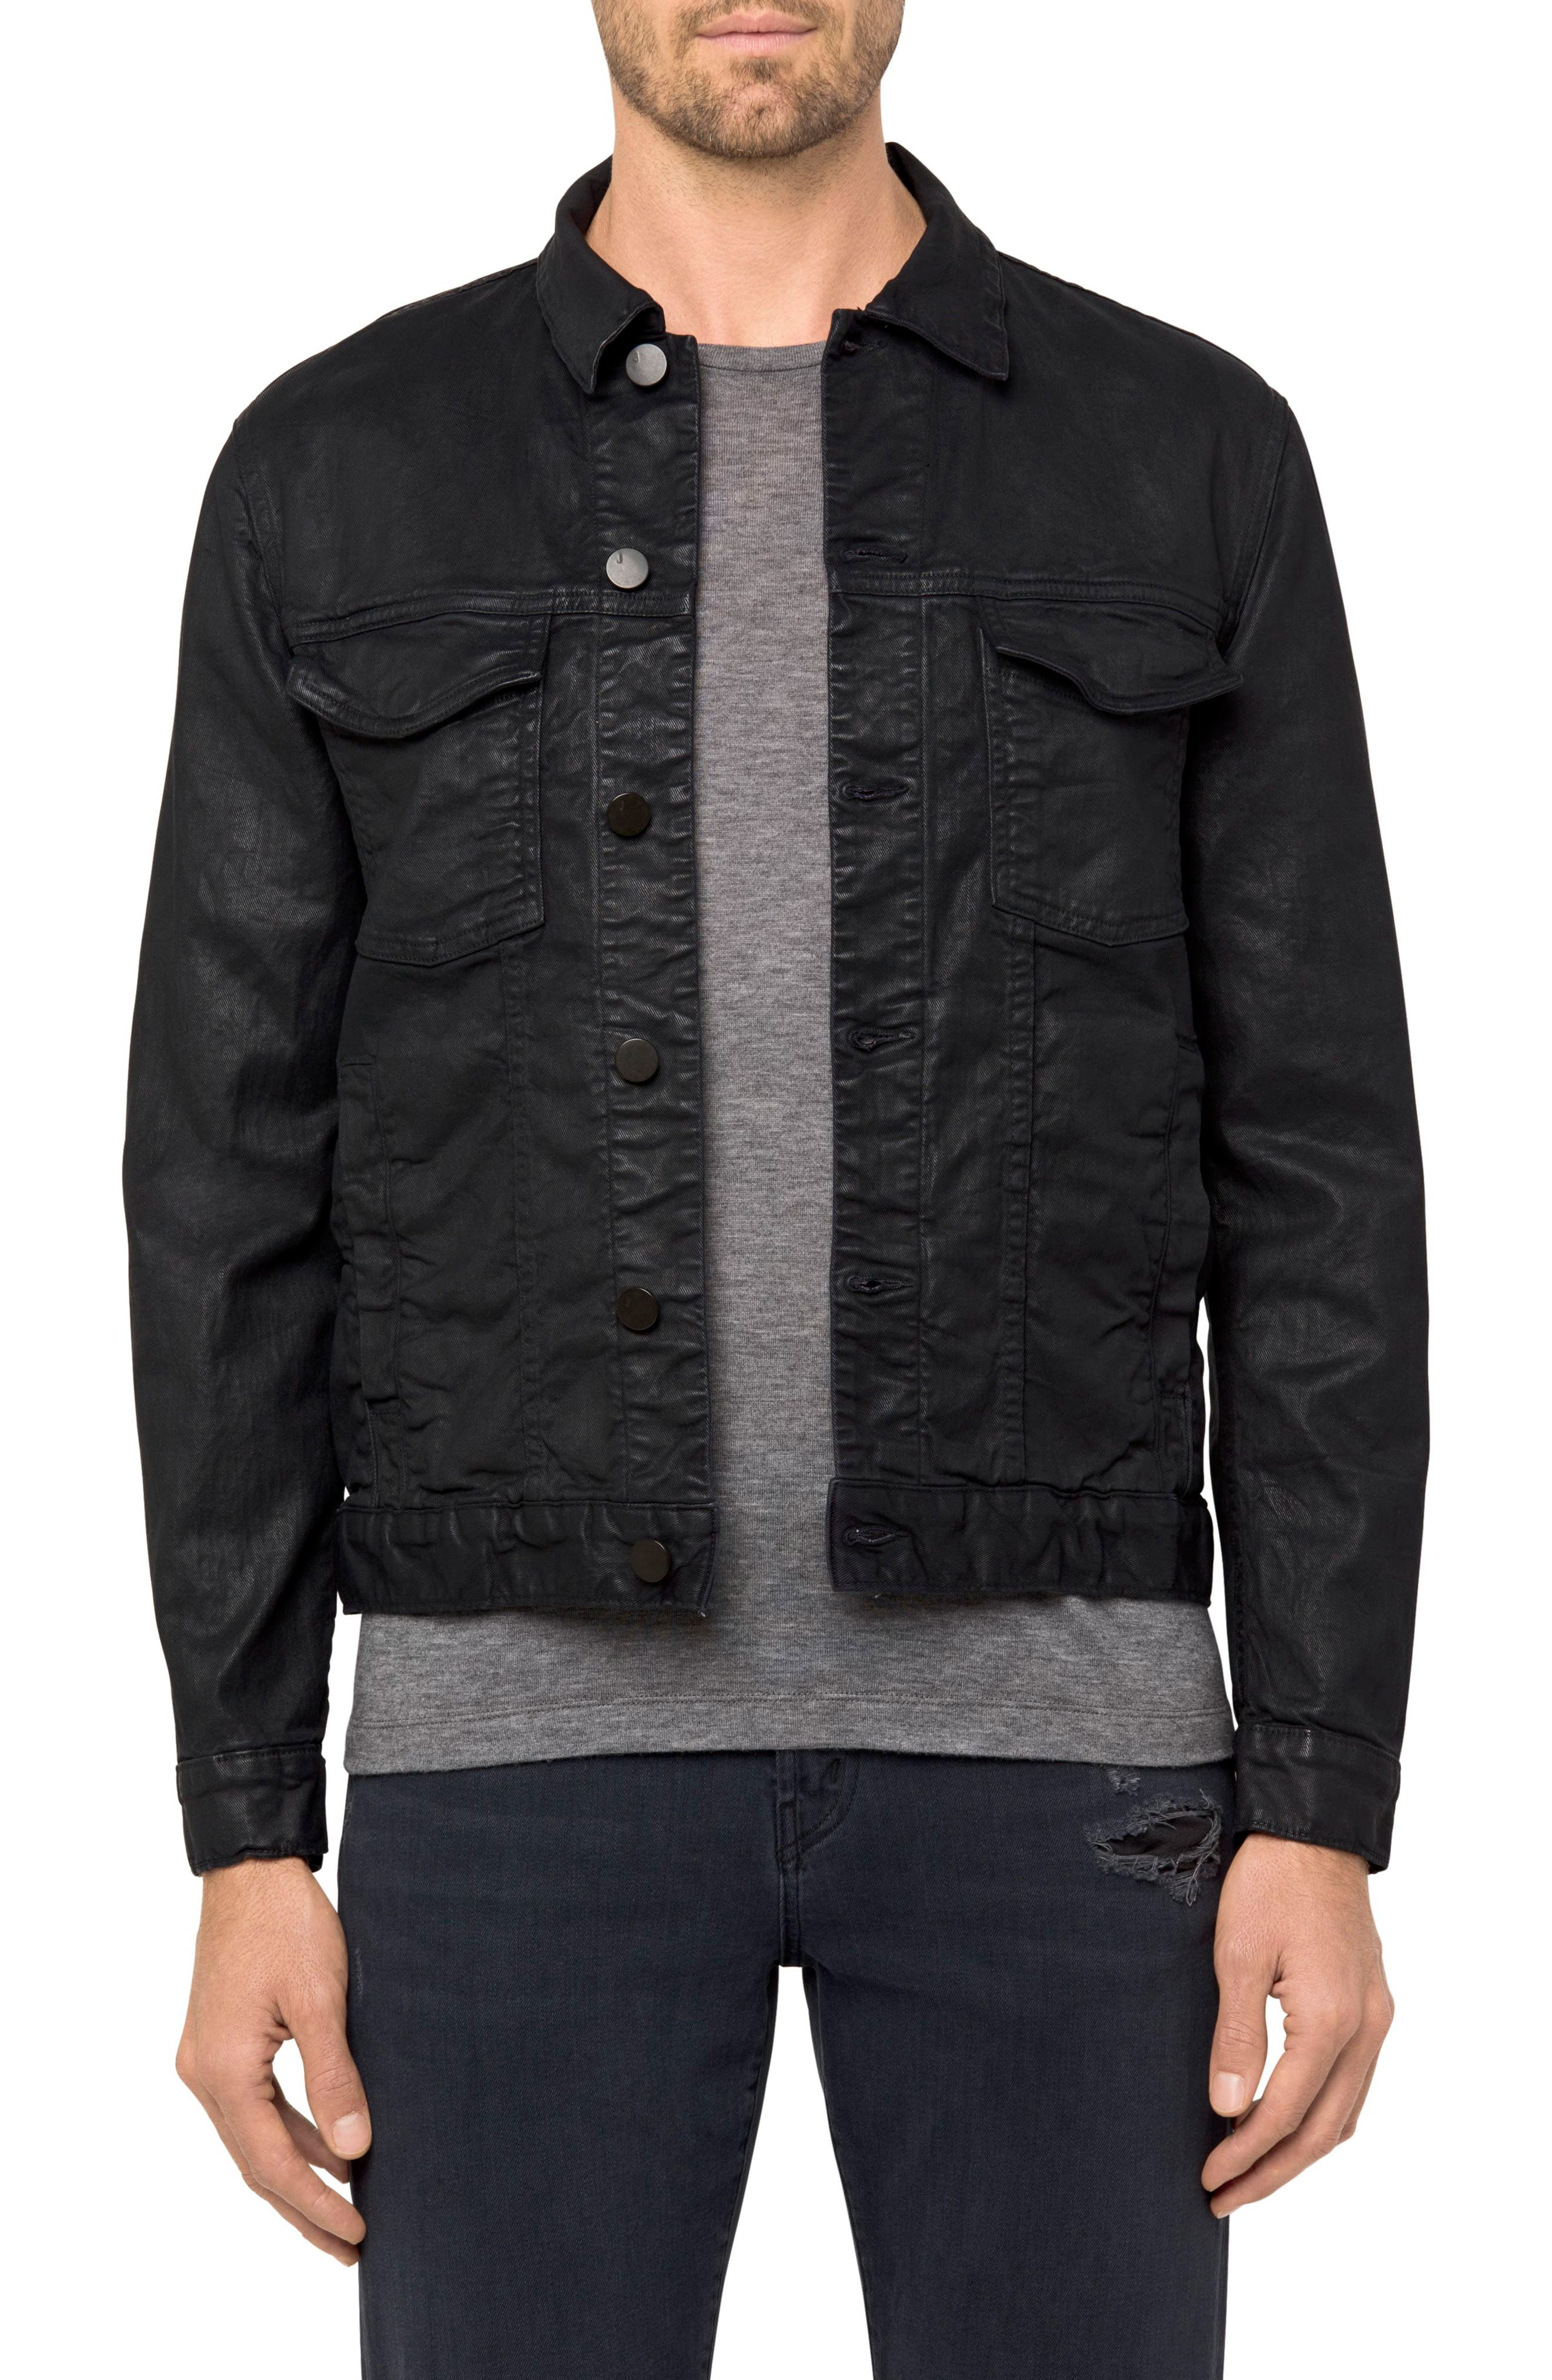 Gorn Denim Jacket,                         Main,                         color, 001